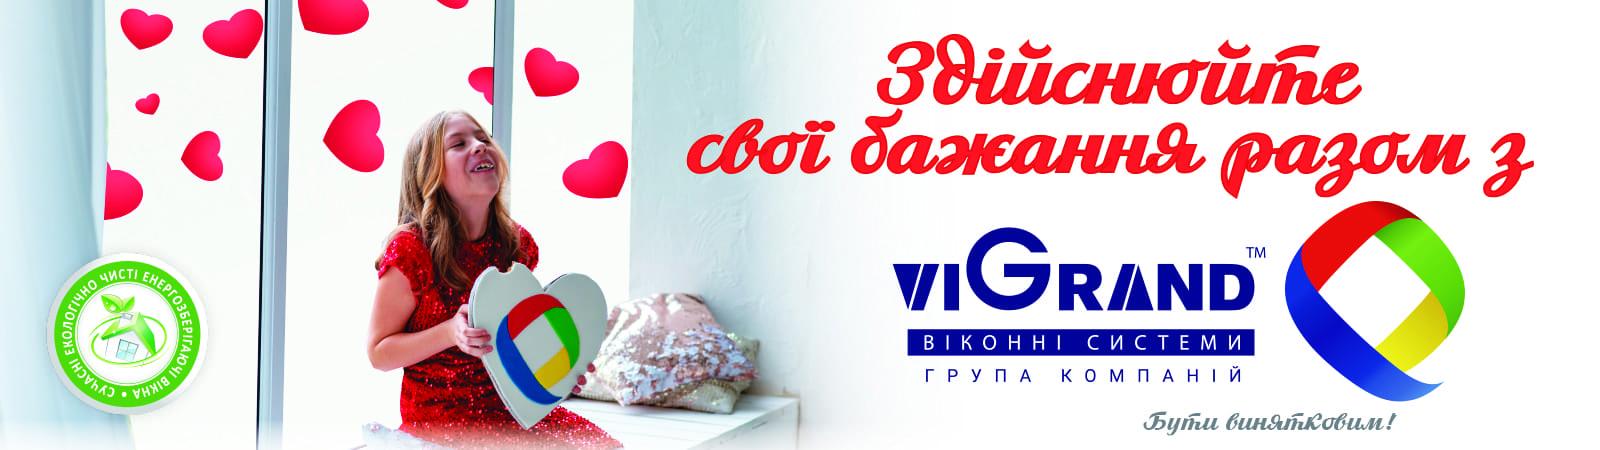 mria banner ua - Головна